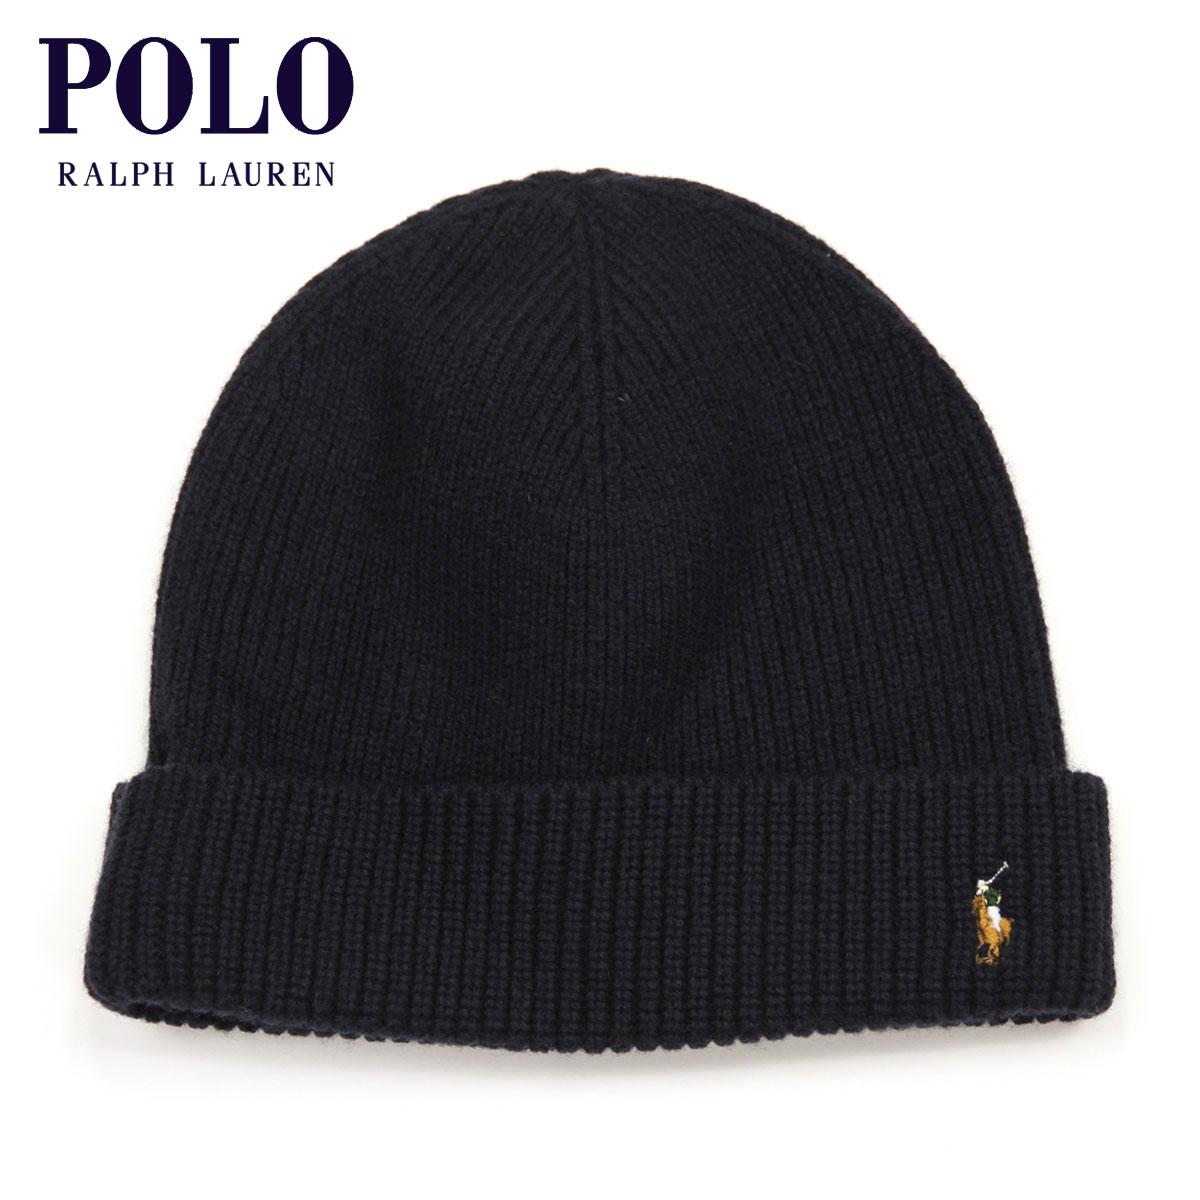 c117feddec6 Polo Ralph Lauren POLO RALPH LAUREN regular article knit cap MERINO WOOL  WATCH CAP NIGHT D30S40